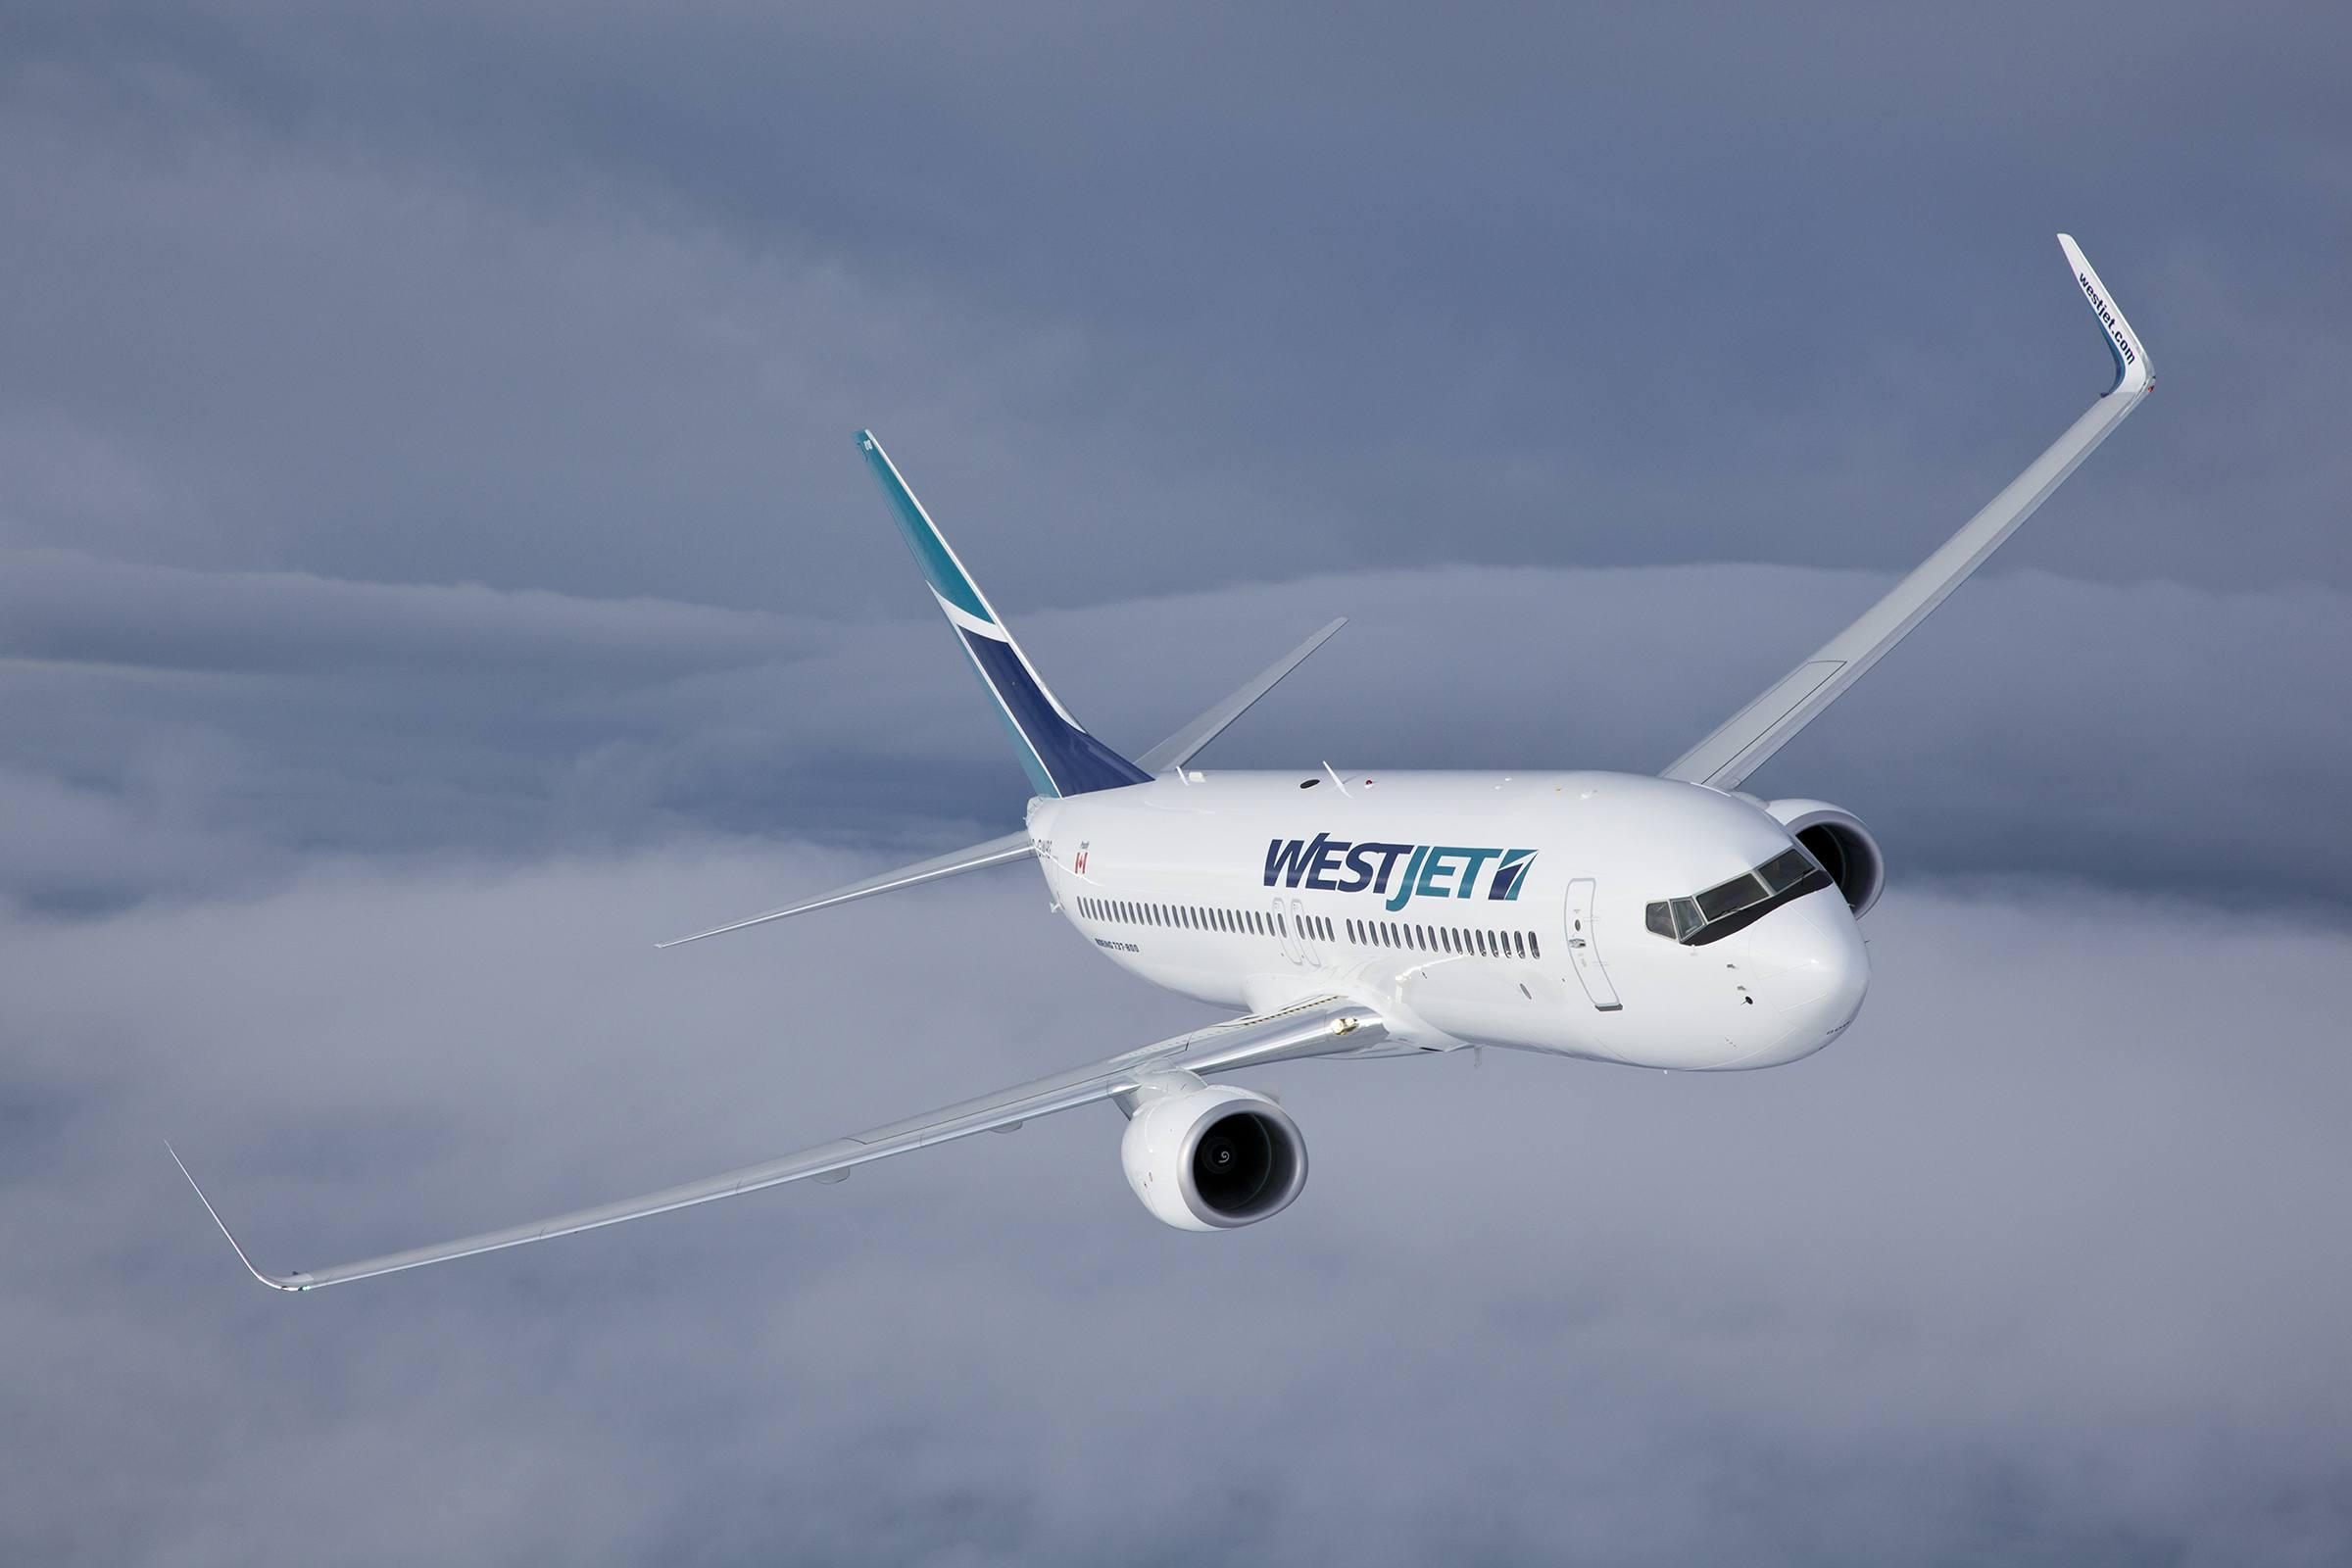 A WestJet plane flies over a cloudy sky